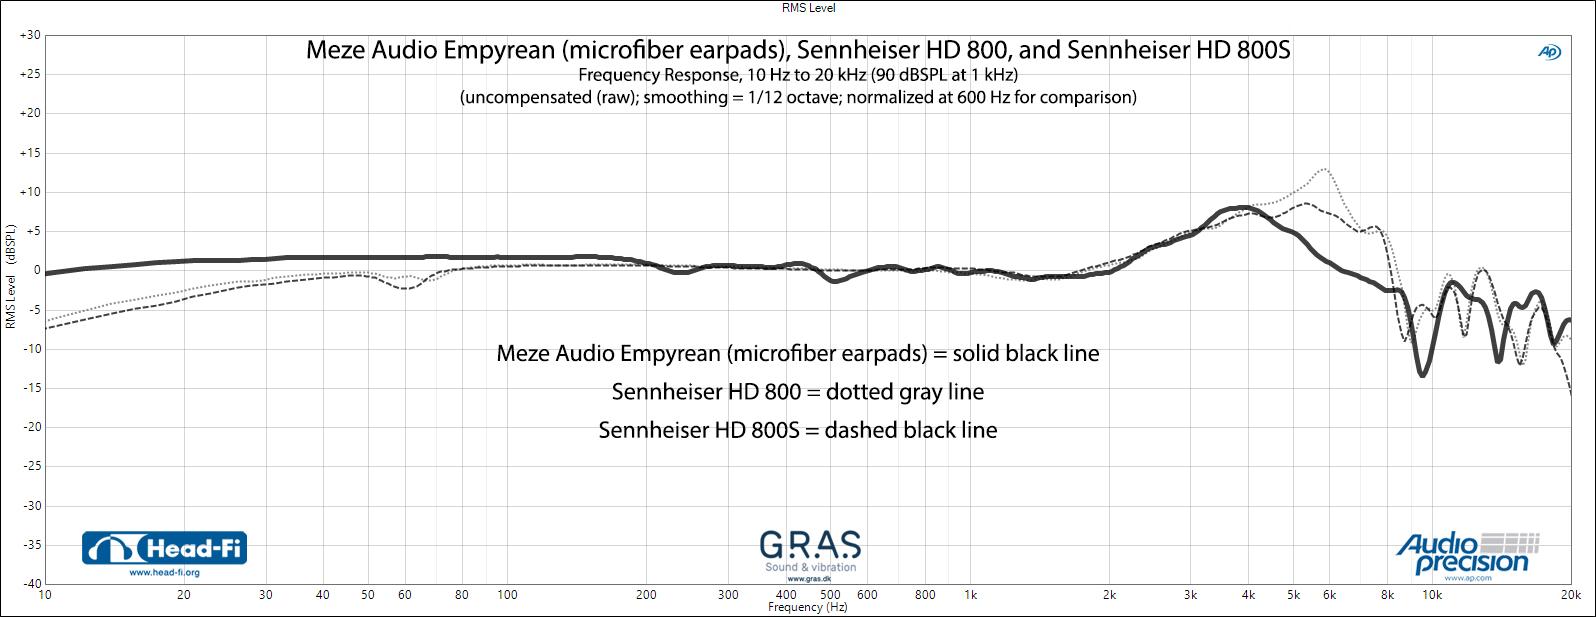 FR_Meze-Empyrean-(microfiber)_HD800S_HD800_normalize-600-Hz.jpg